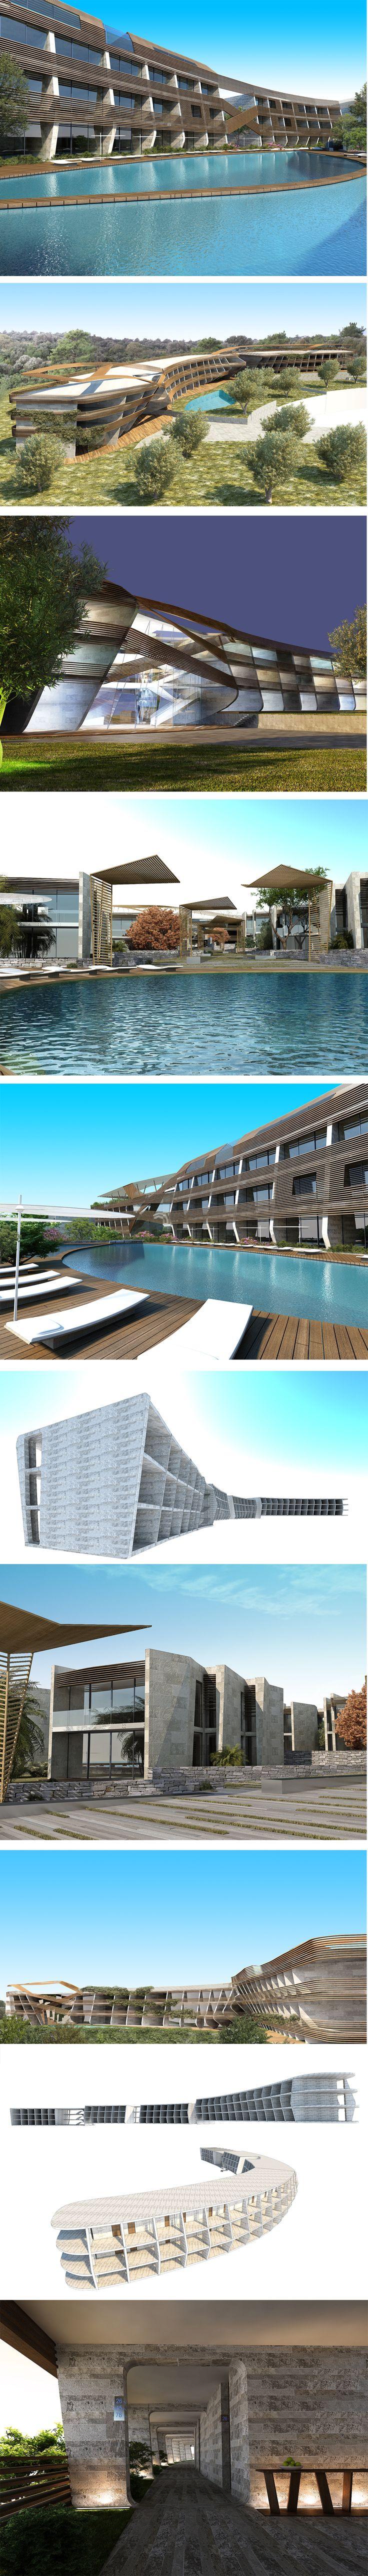 Swissotel Resort Bodrum Beach hotel, a twisting structure, is located on the highest point of the site and serves as the entry gateway to the development.  #hotel #hoteldesign #architecture #architecturaldrawing #GADarchitecture #GAD #interiordesign #turkey #swissotel #turkiye #architect #mimar #mimarlik #pool #plans #villa #bodrum #luxury #largeimage #gokhanavcioglu #gadarchitecture #gadfoundation